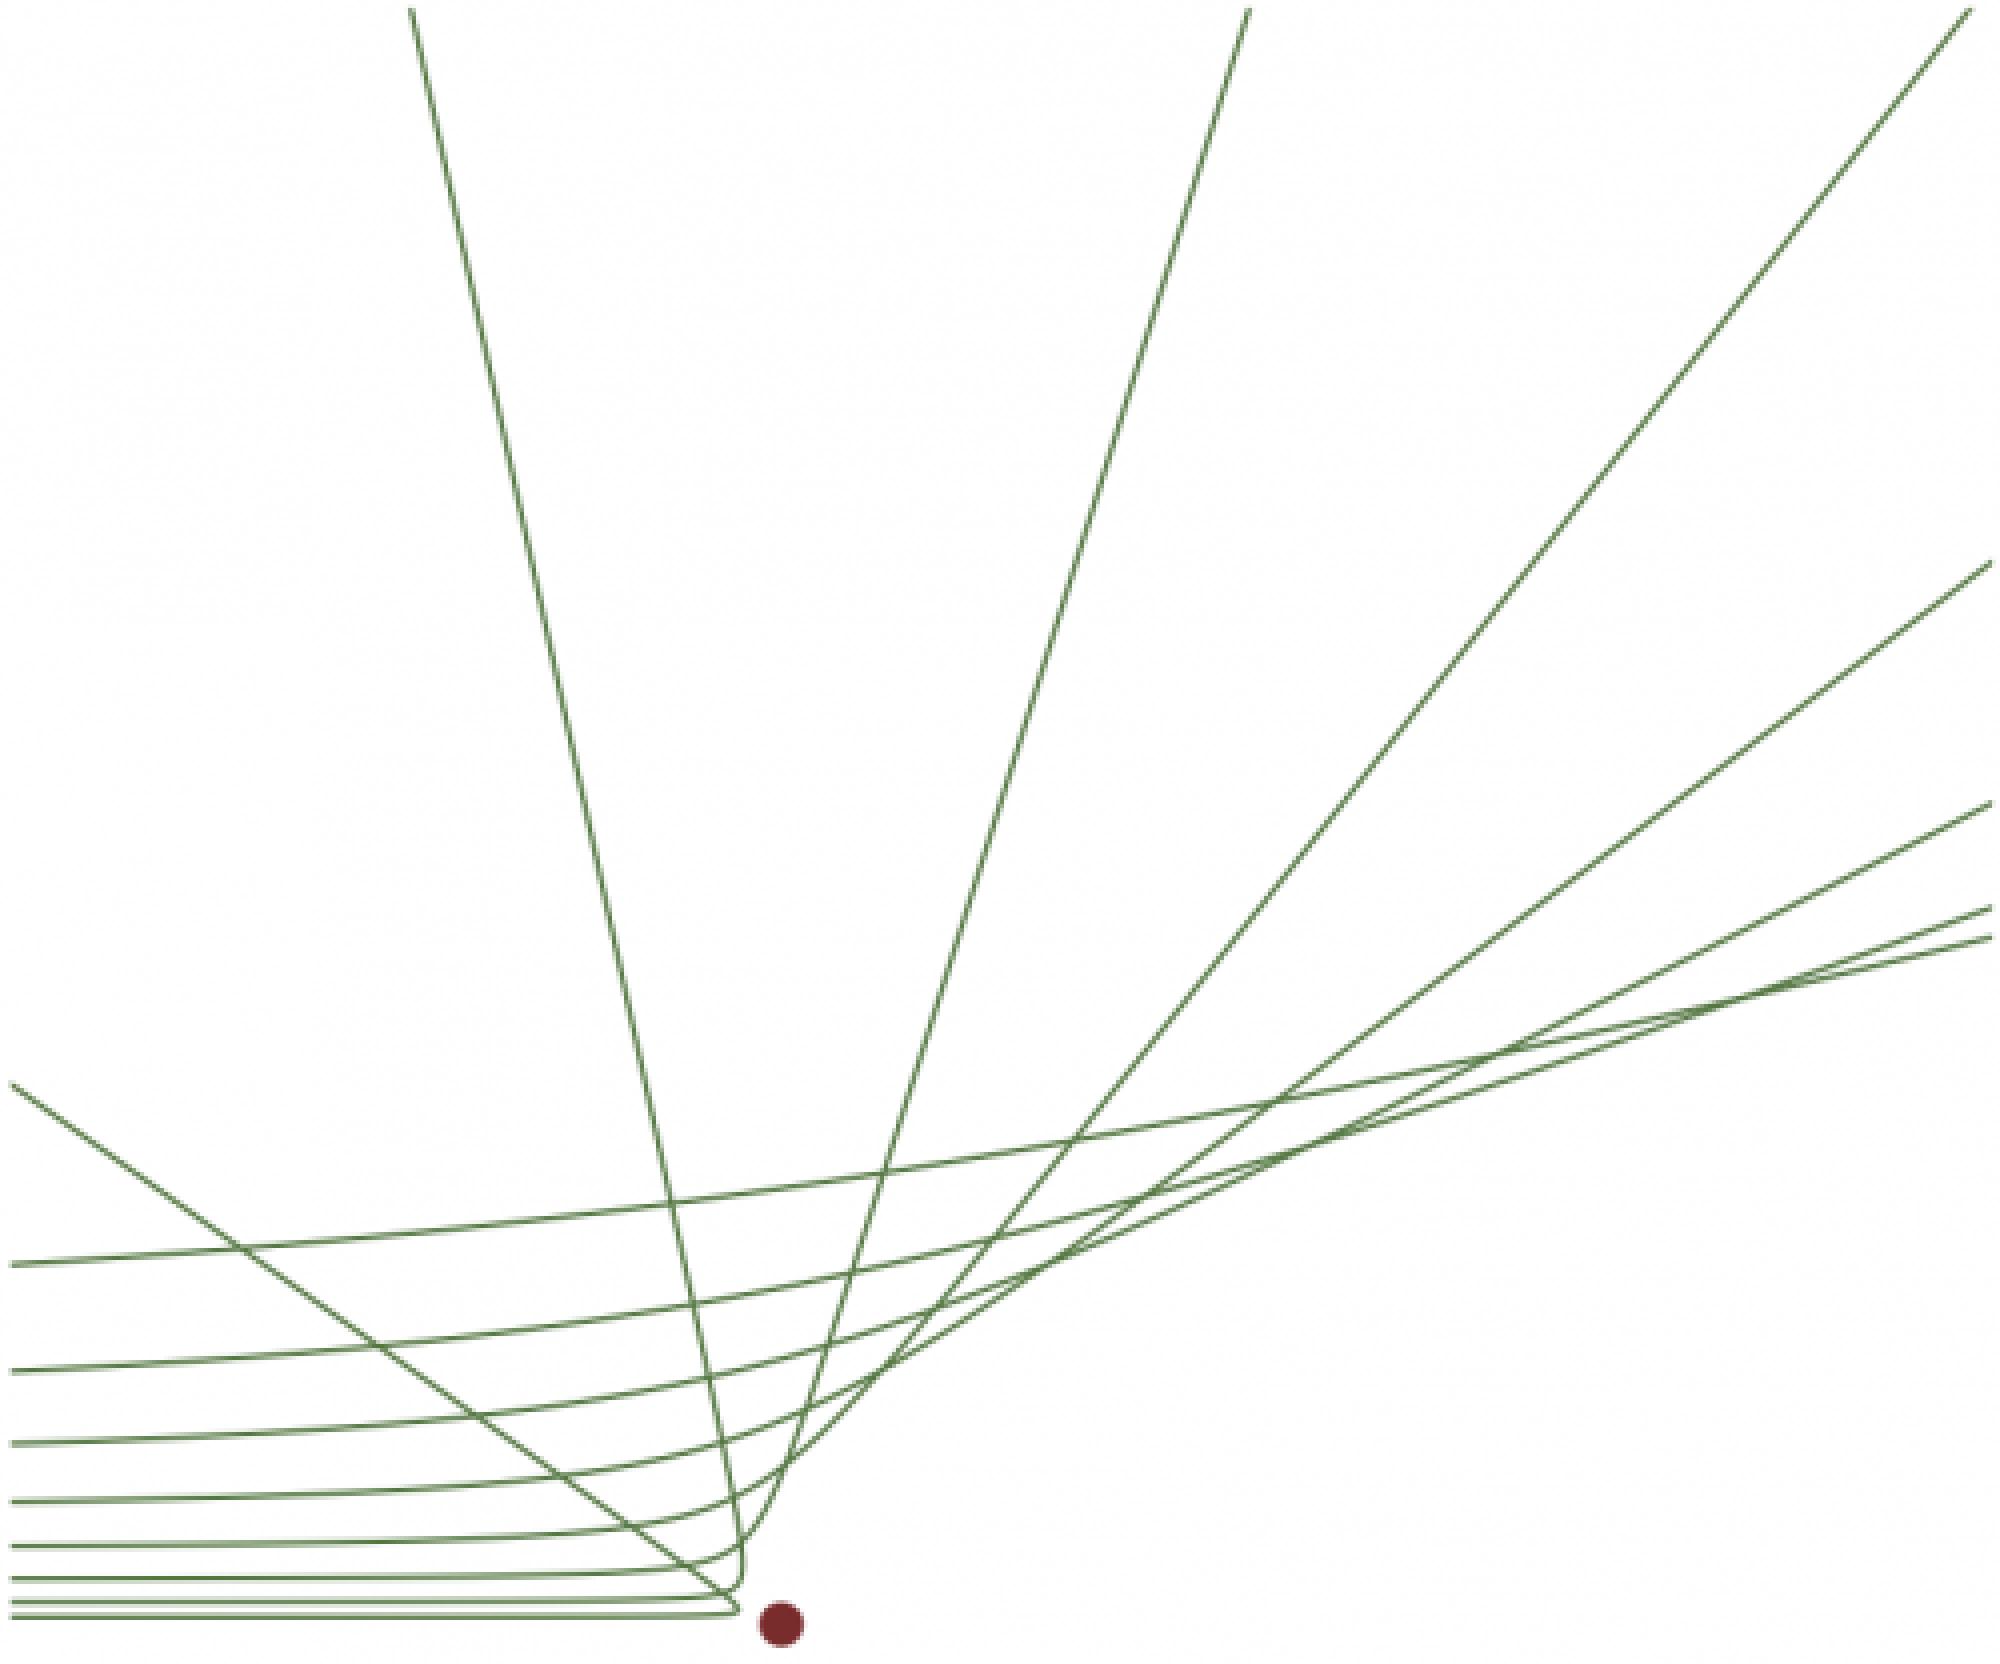 latex:tikz [CMS Wiki Pages]